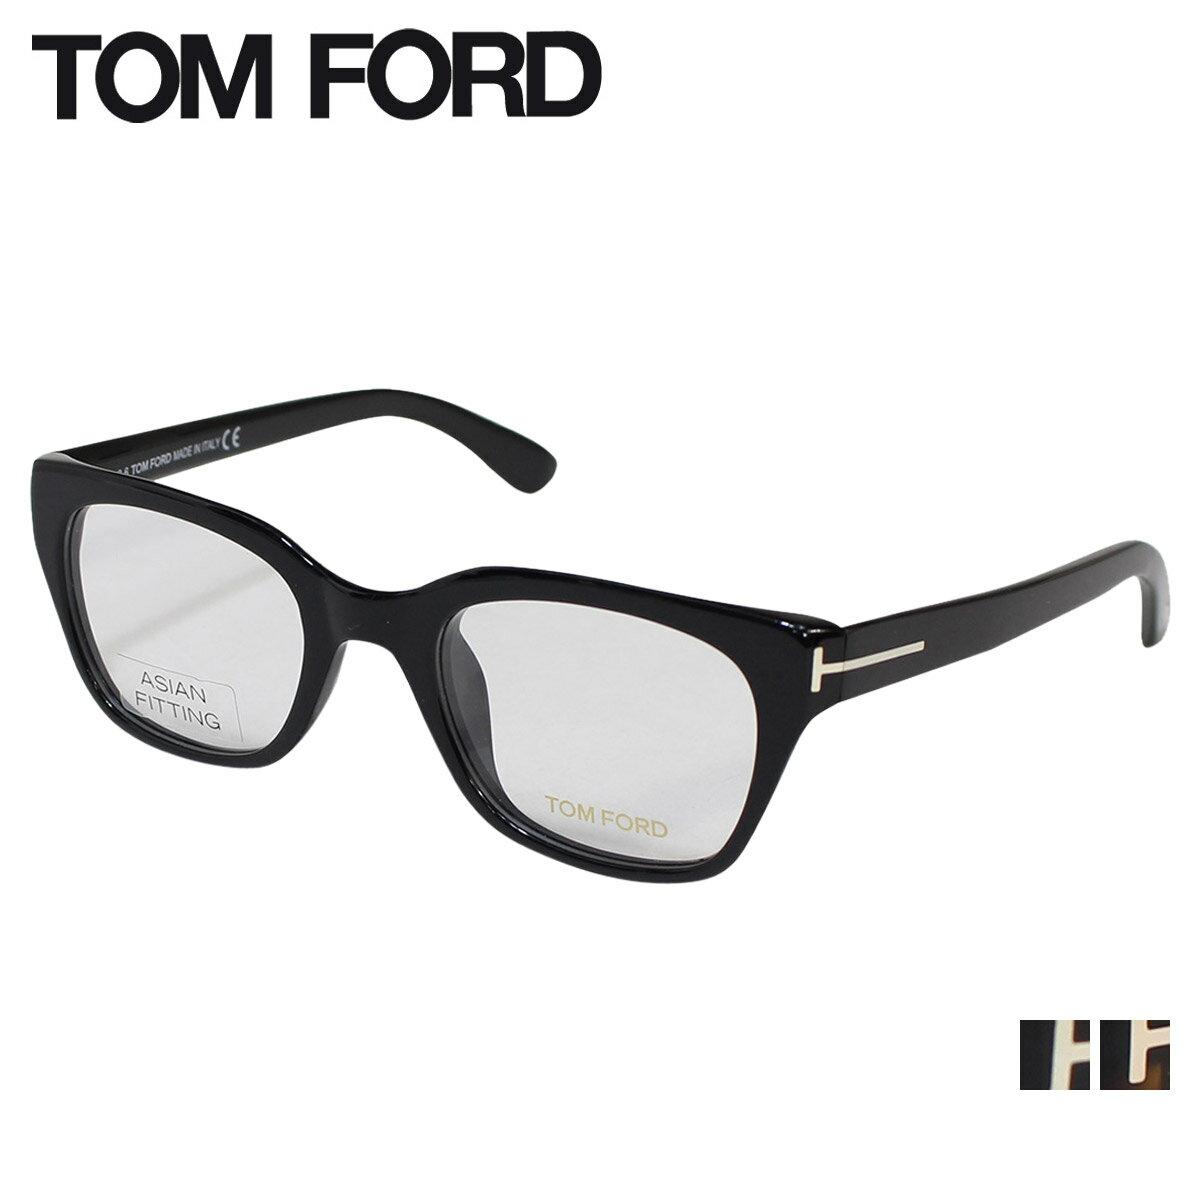 TOM FORD ASIAN FITTING メガネ トムフォード 眼鏡 メンズ レディース アイウェア FT4240 イタリア製 [182] 【決算セール】